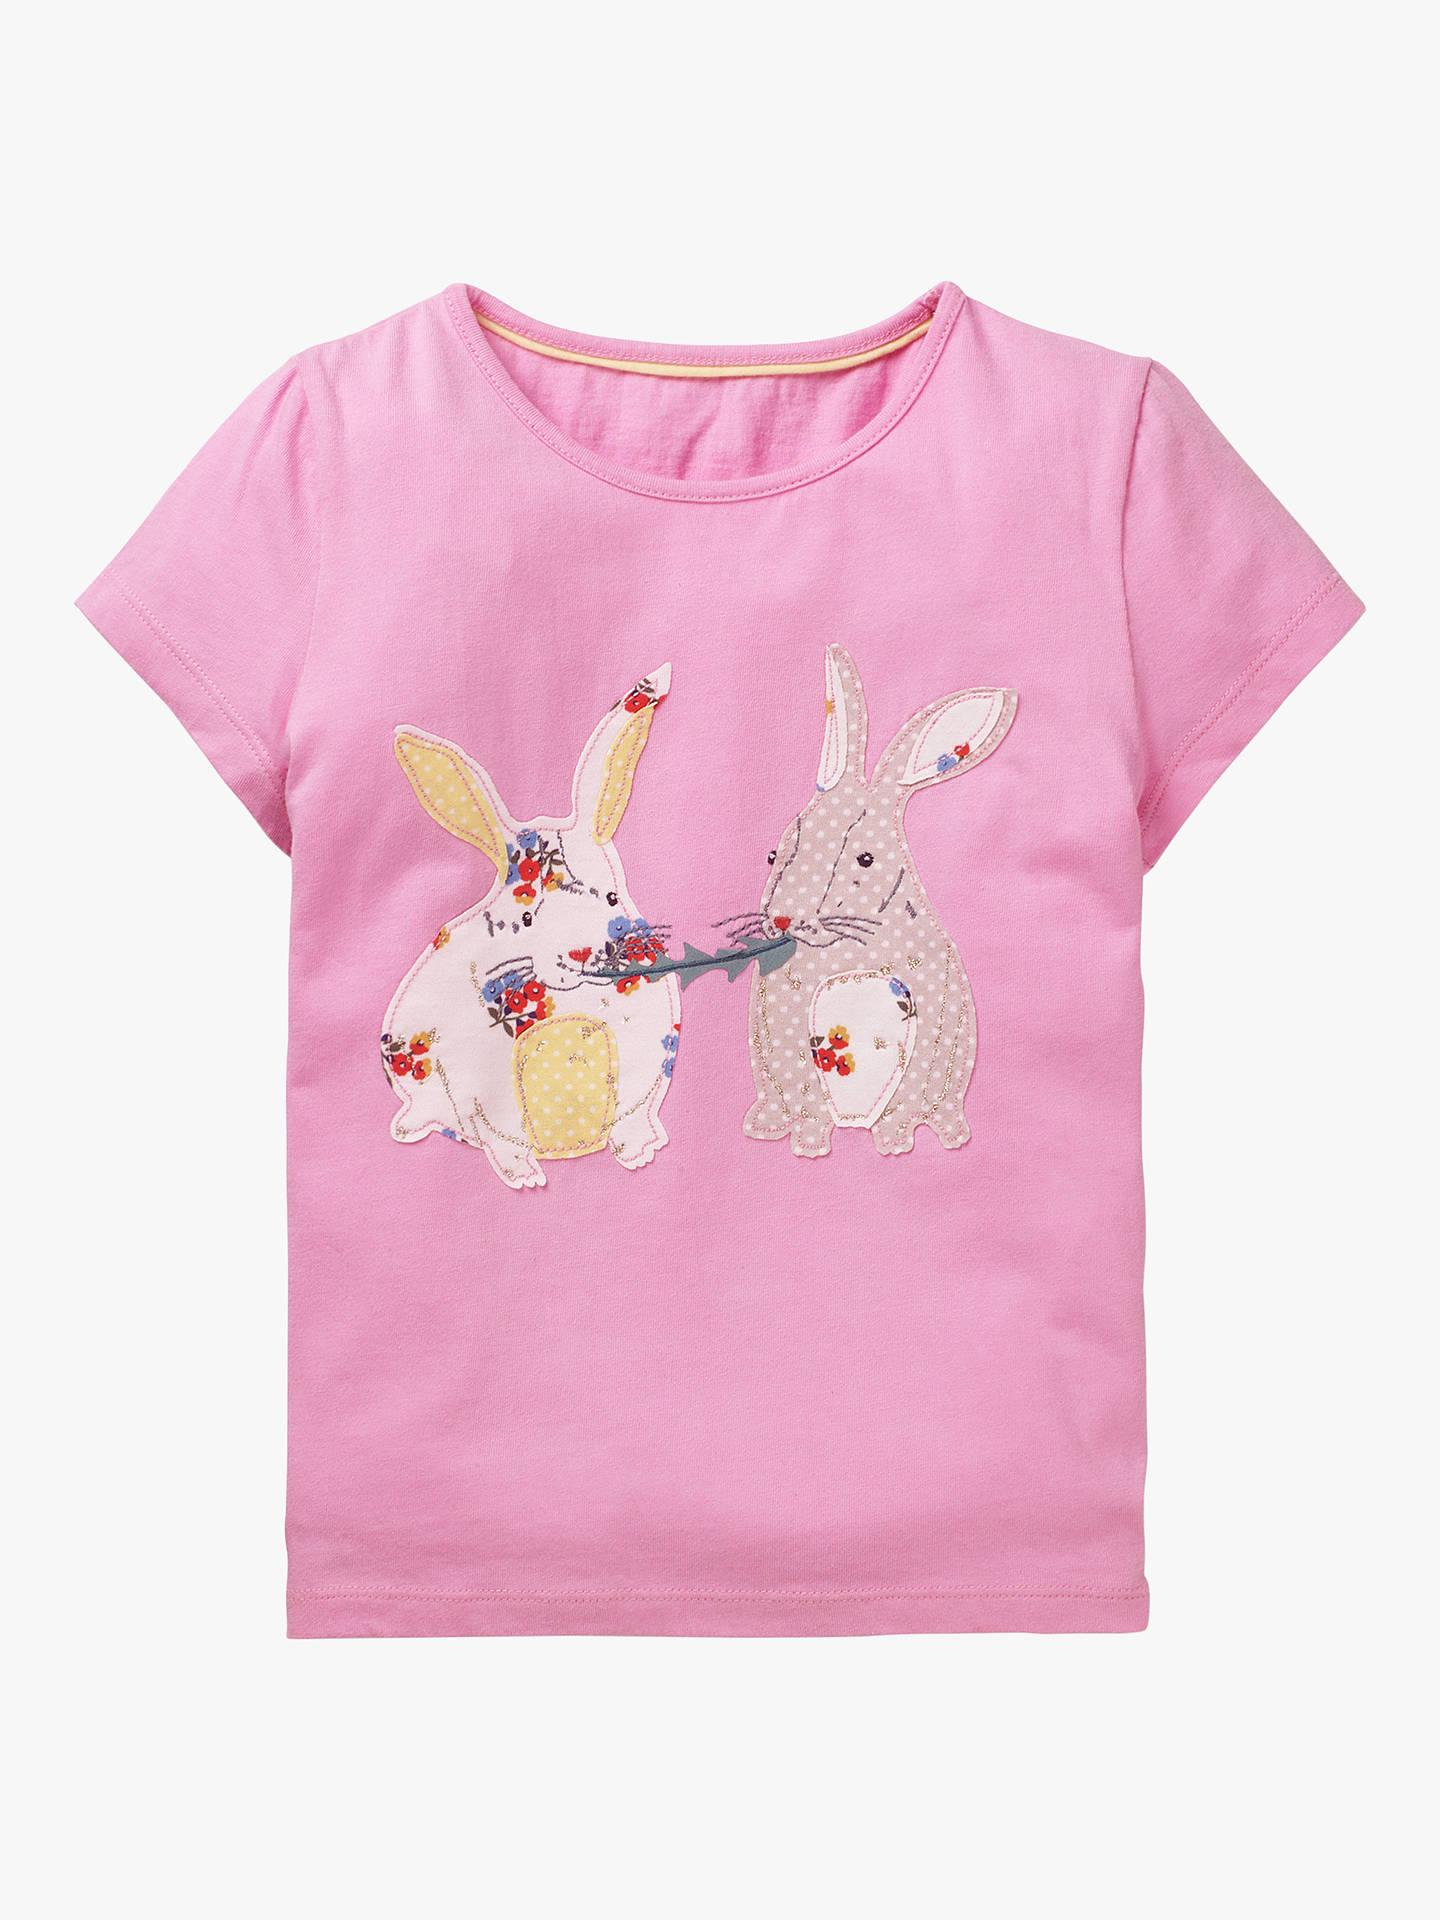 8b11c61bcd Mini Boden Girls' Bunny Applique T-Shirt, Pink at John Lewis & Partners